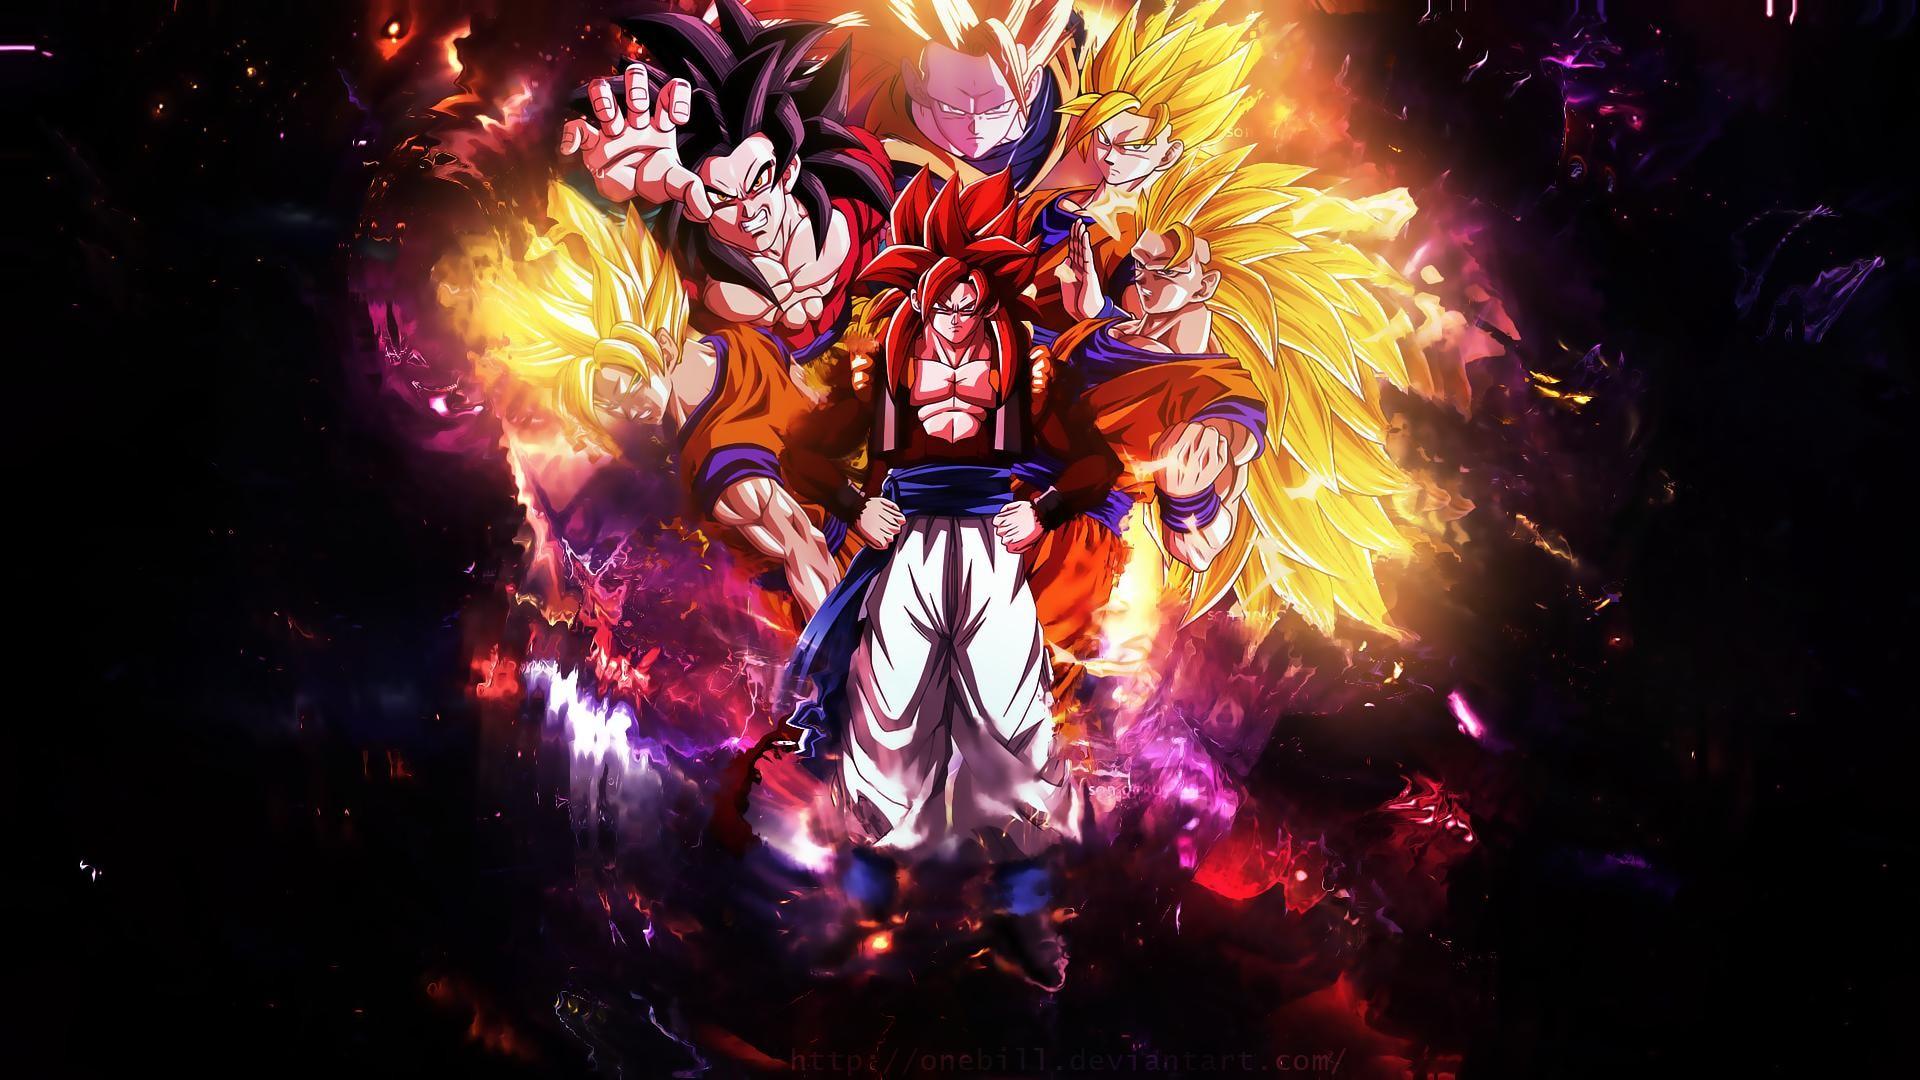 Super Saiyan Live Wallpaper Iphone X Dragon Ball Goku Wallpaper 70 Images